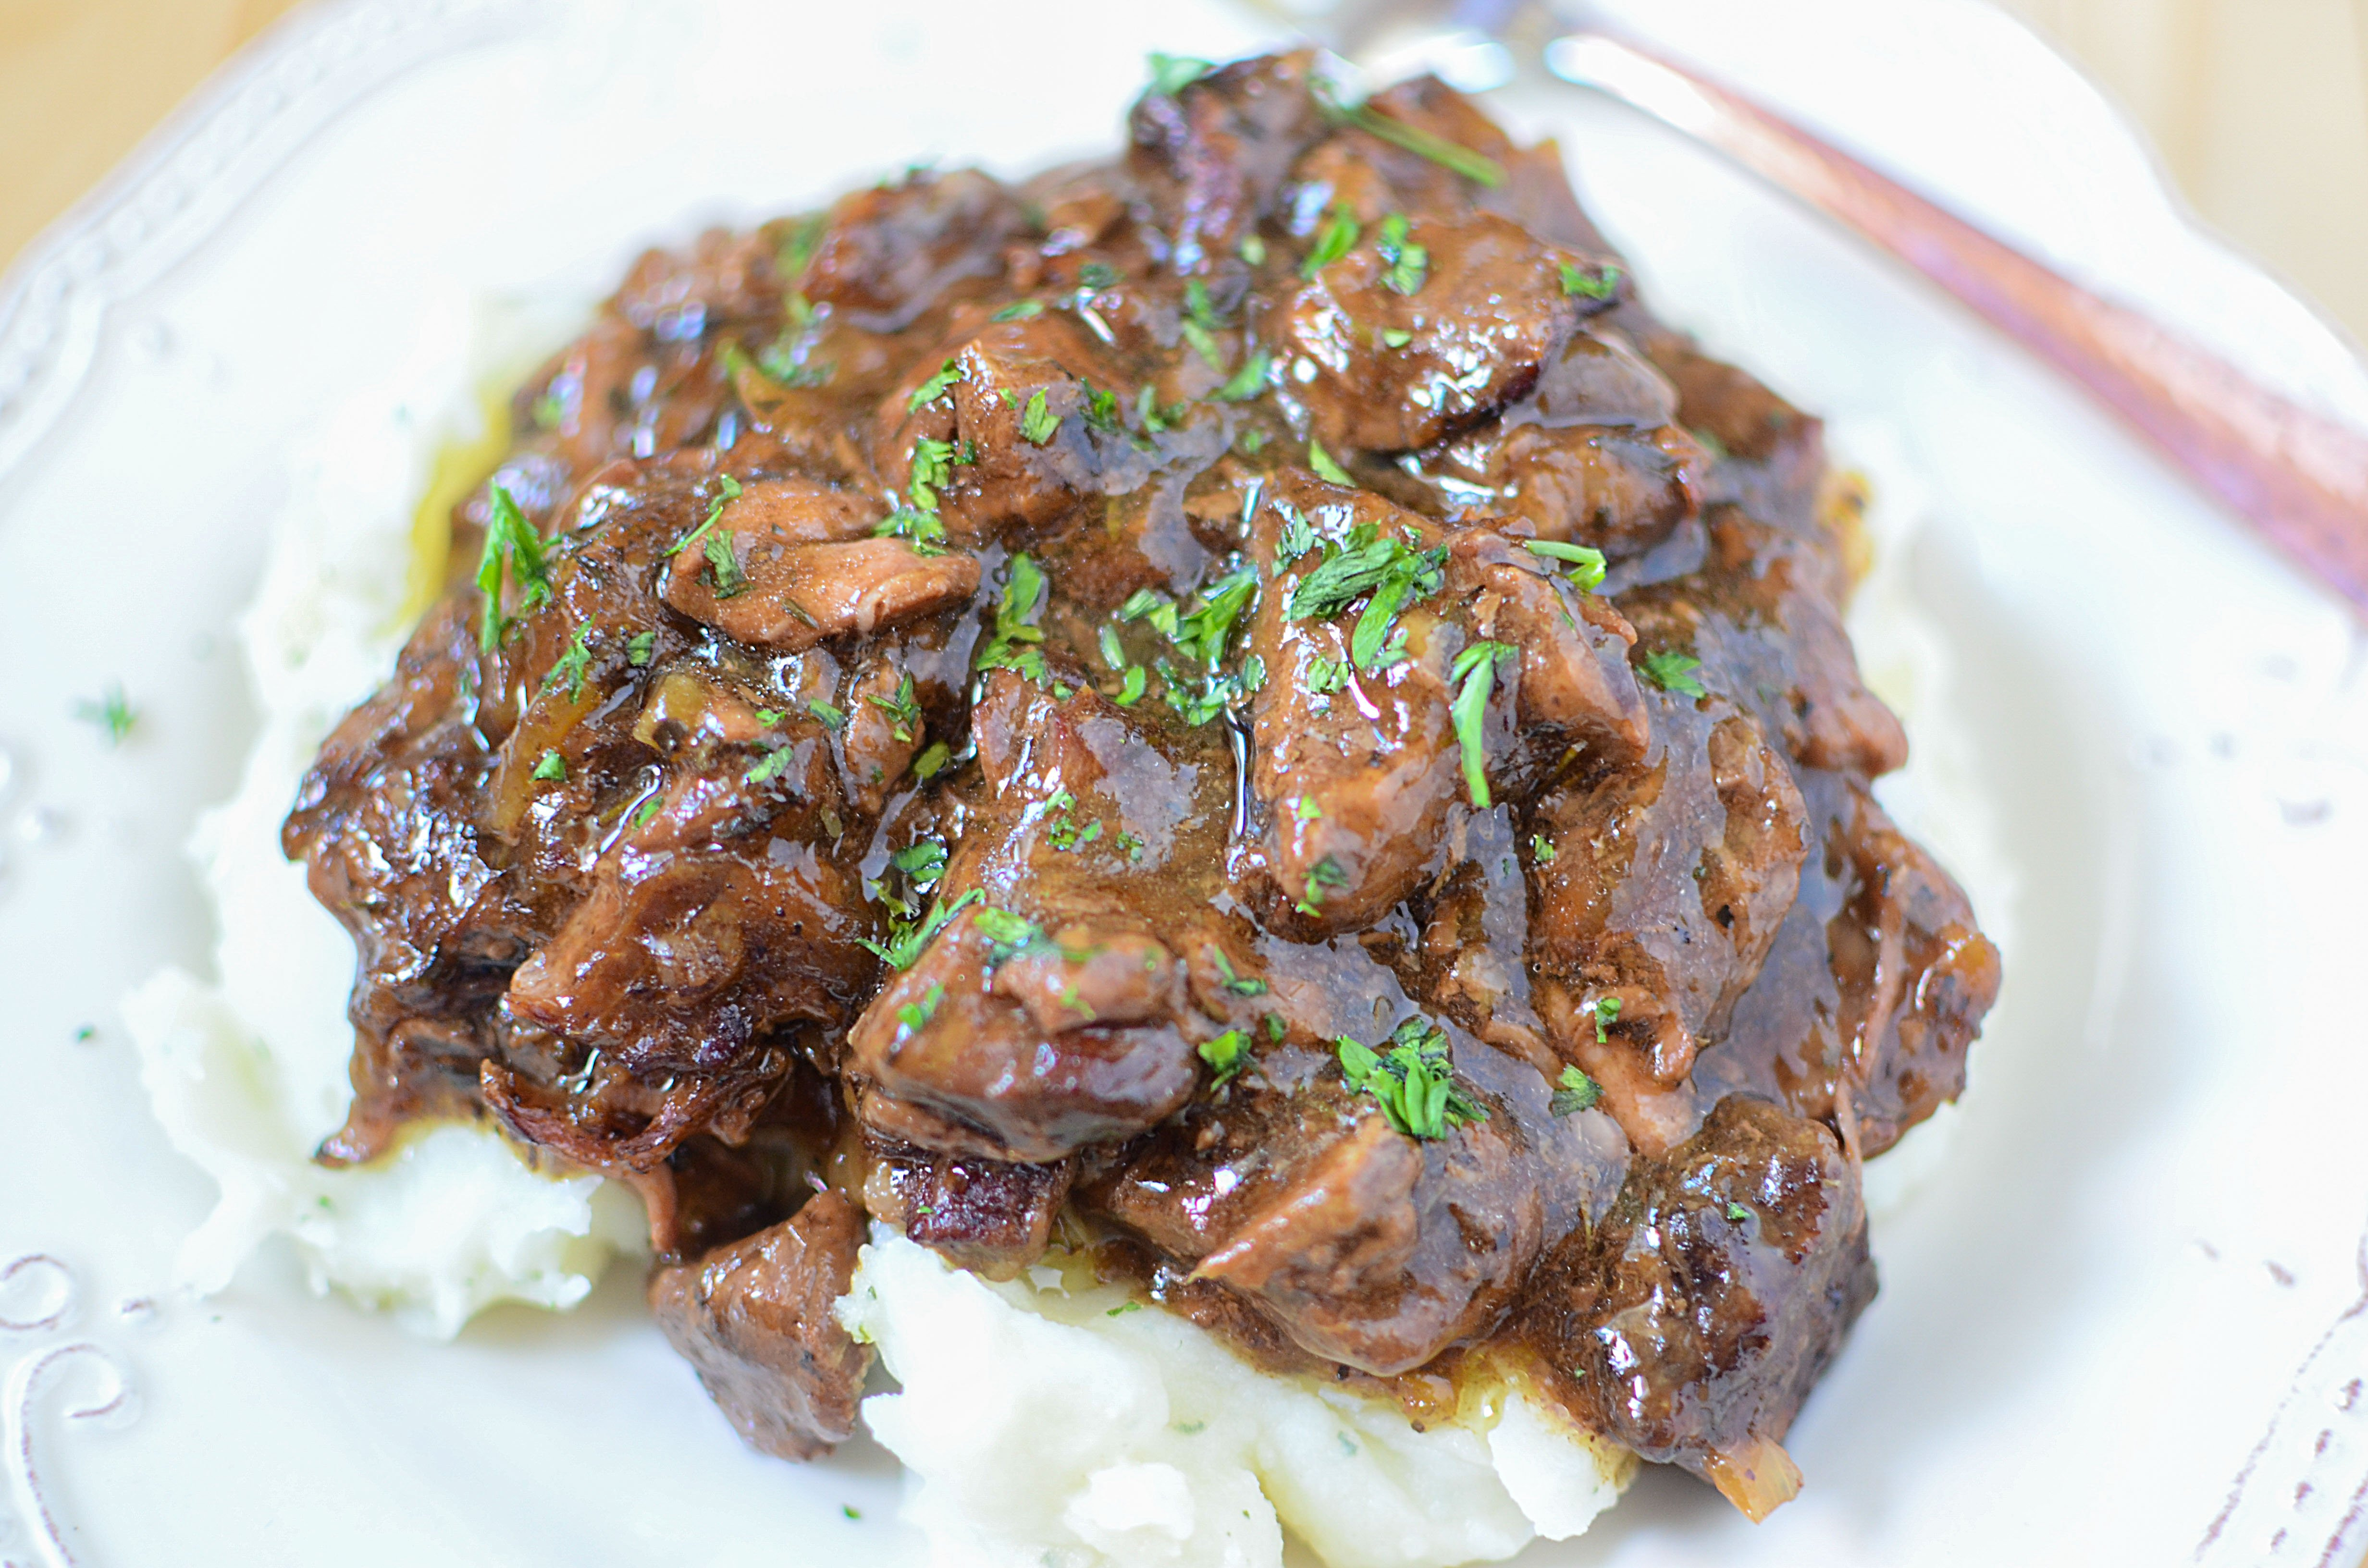 Slow Cooker Sirloin Steak Recipes - CheckNows.CO